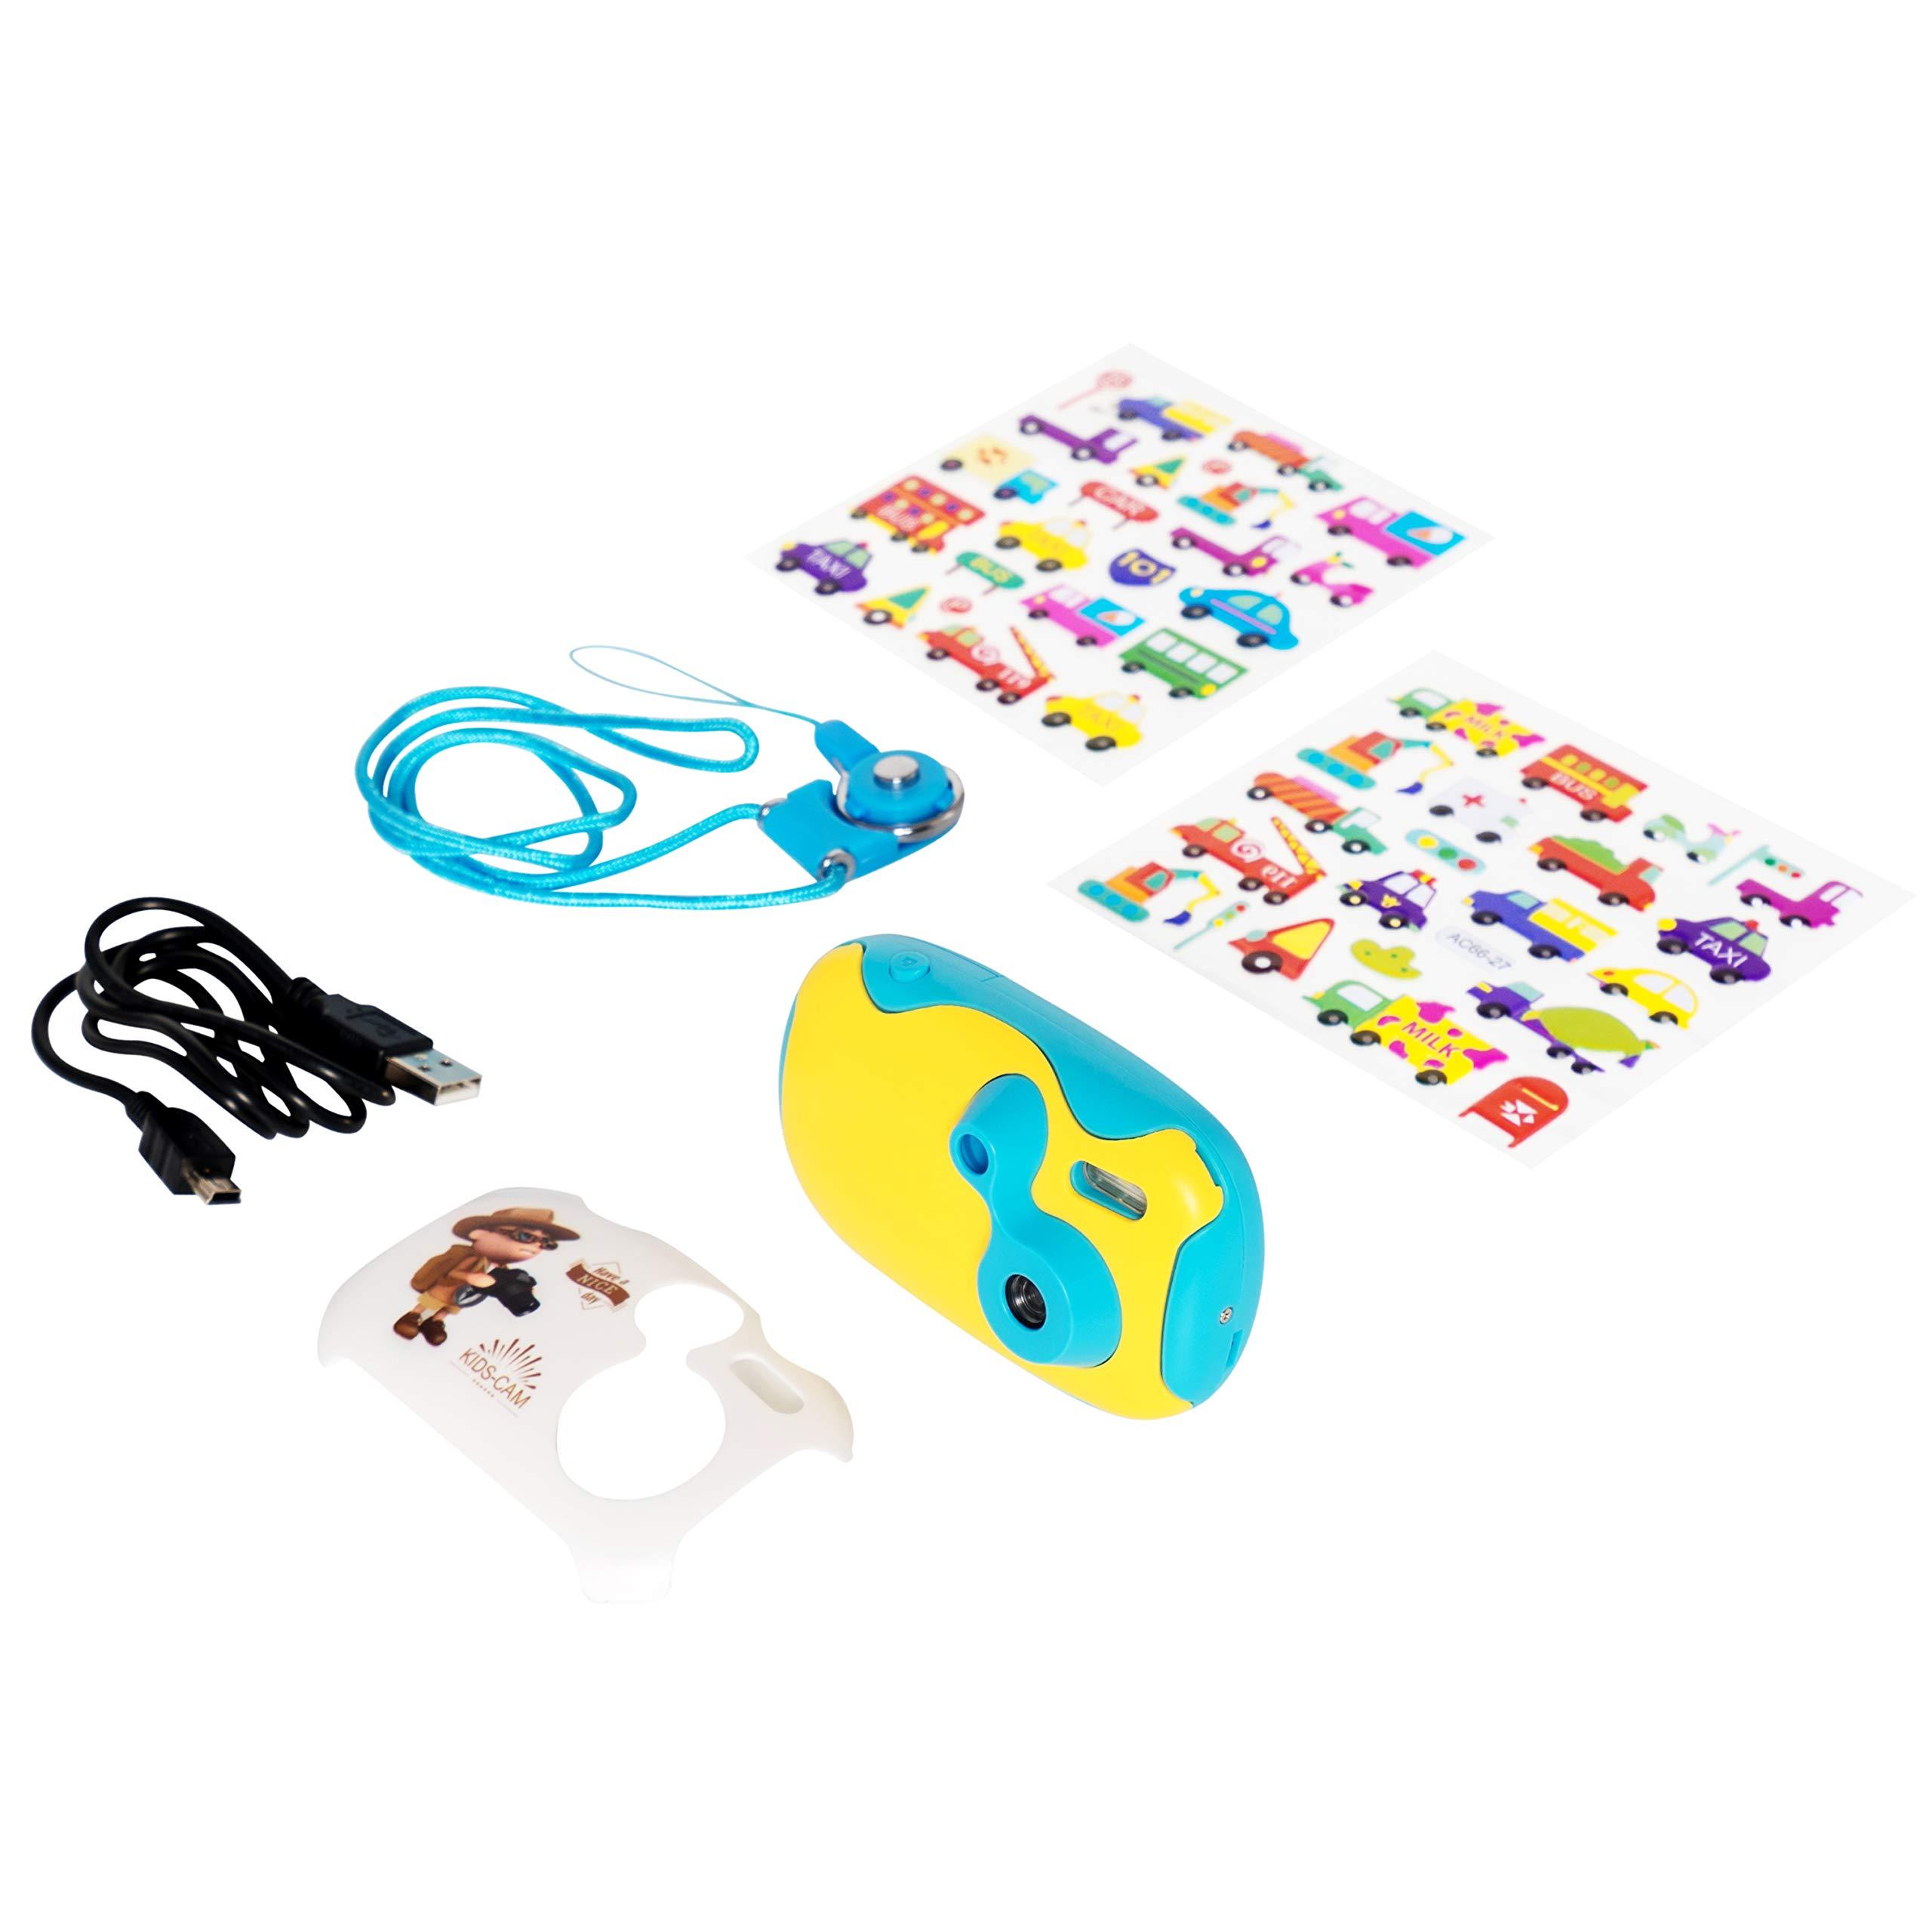 AMKOV DF-03 Toy Camera for Kids, Mini 1.44 inch HD Display Children Camera, Blue